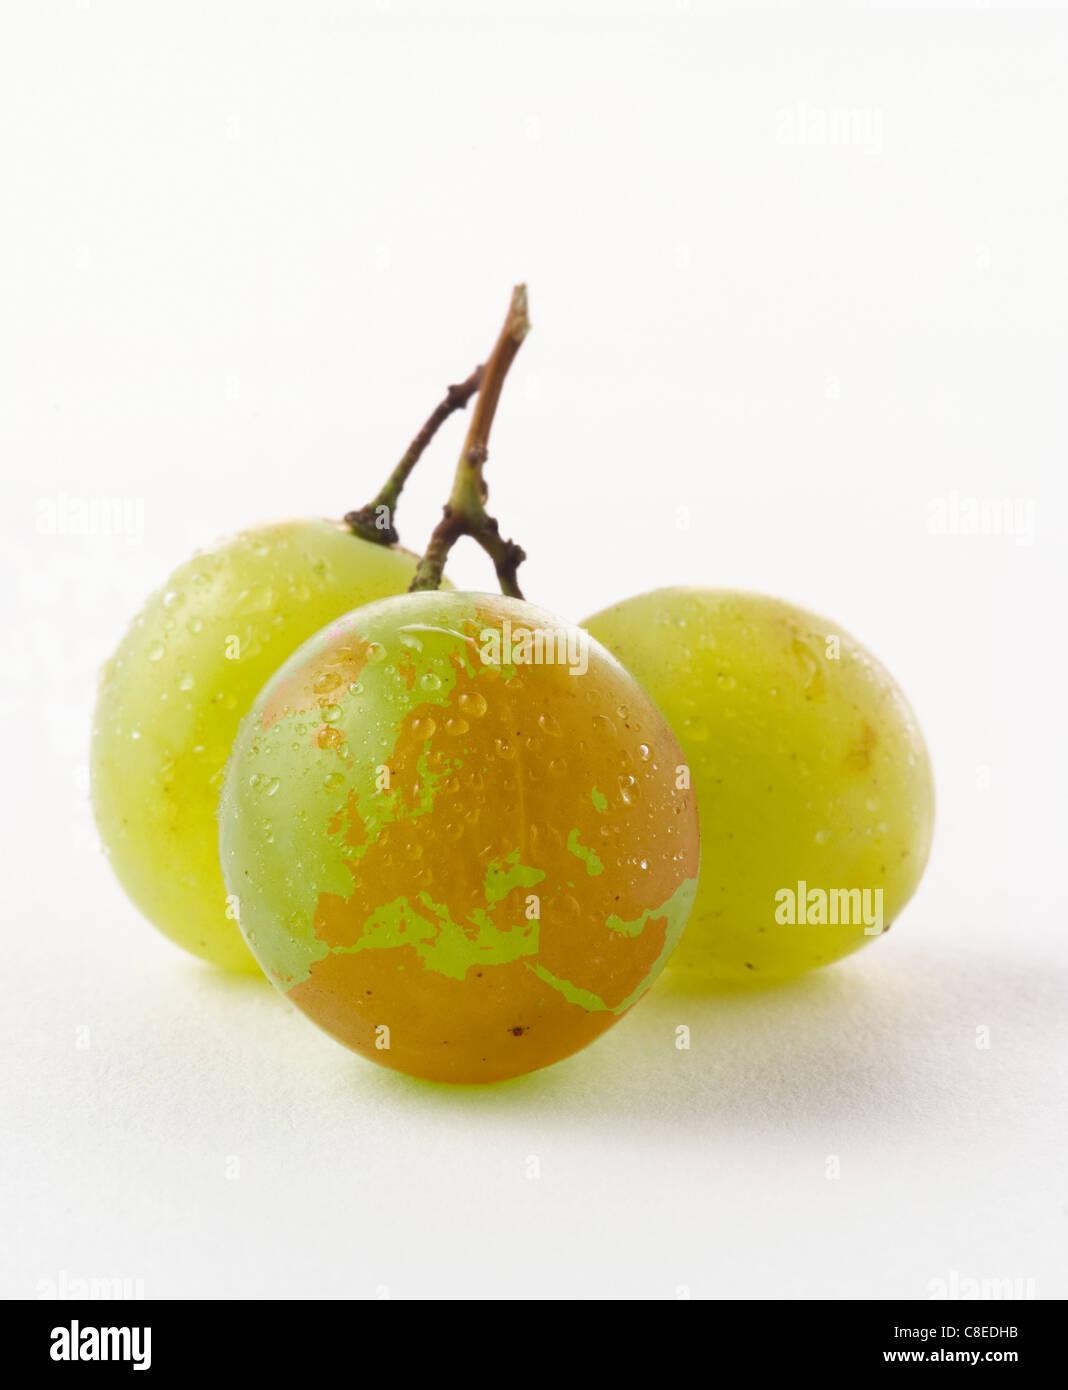 European continent drawn on a white grape - Stock Image